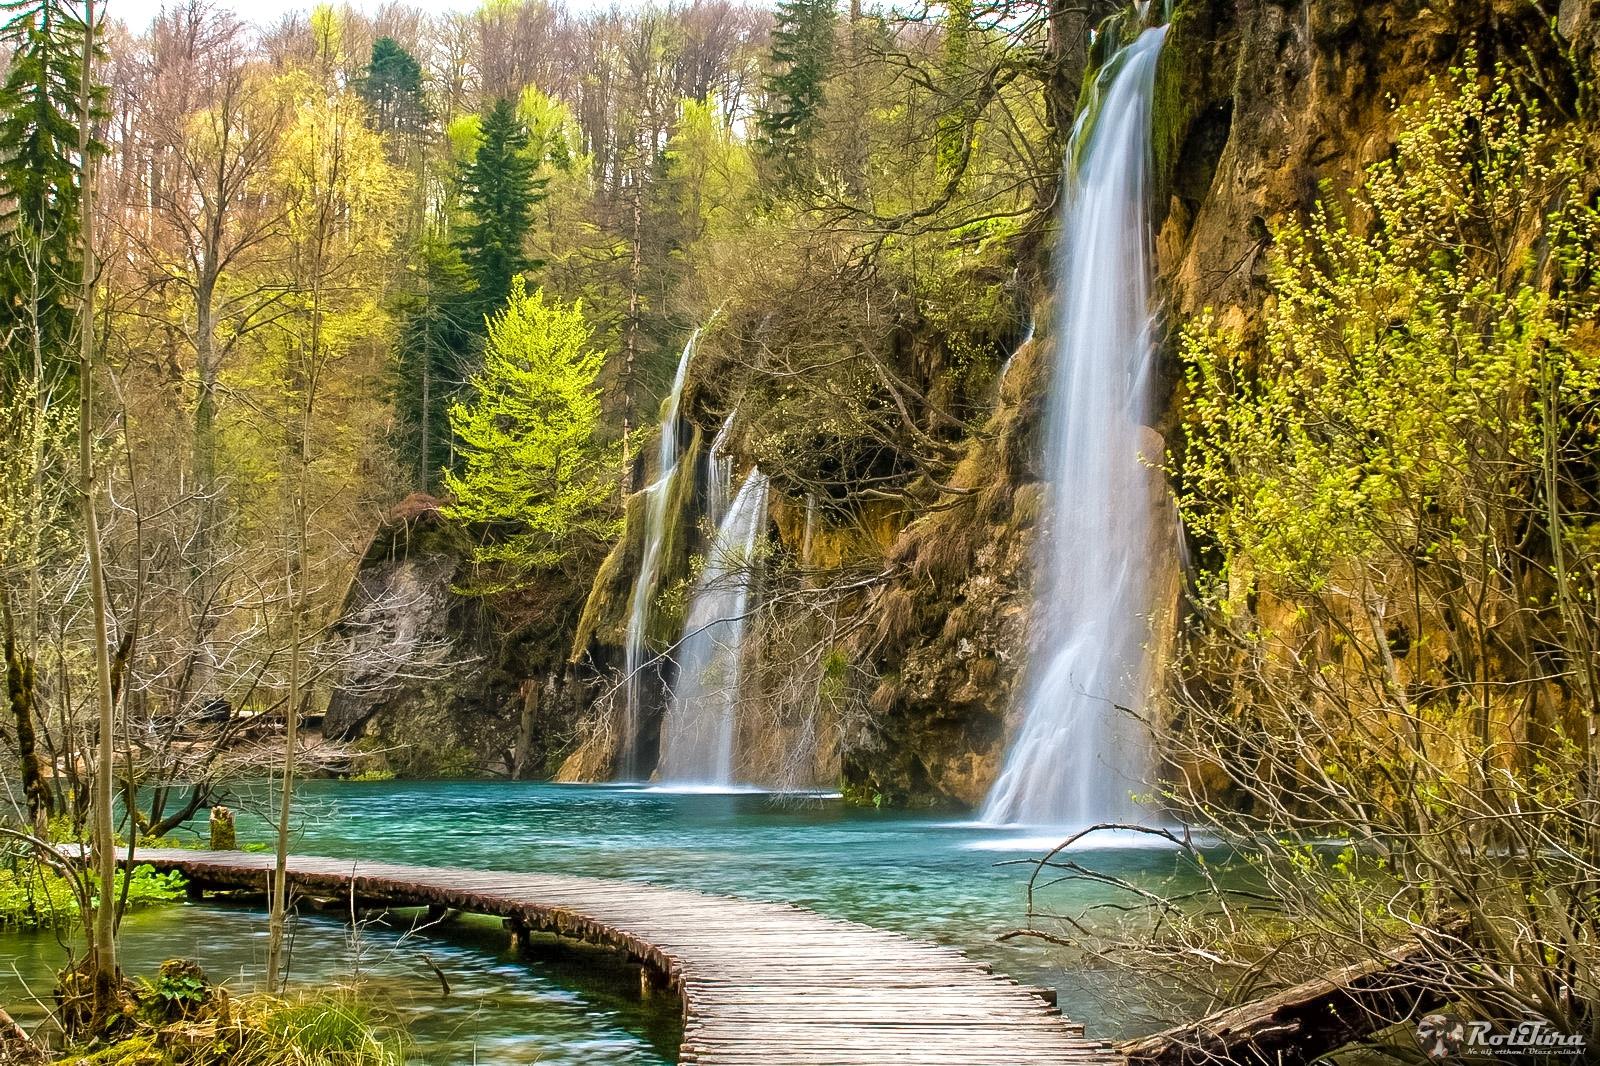 Plitvicei-tavak 2 napos kirándulás Plitvicei-tavak, Horvátország #7939bfc3-e93c-47e5-8aa1-2f9ffc908b79